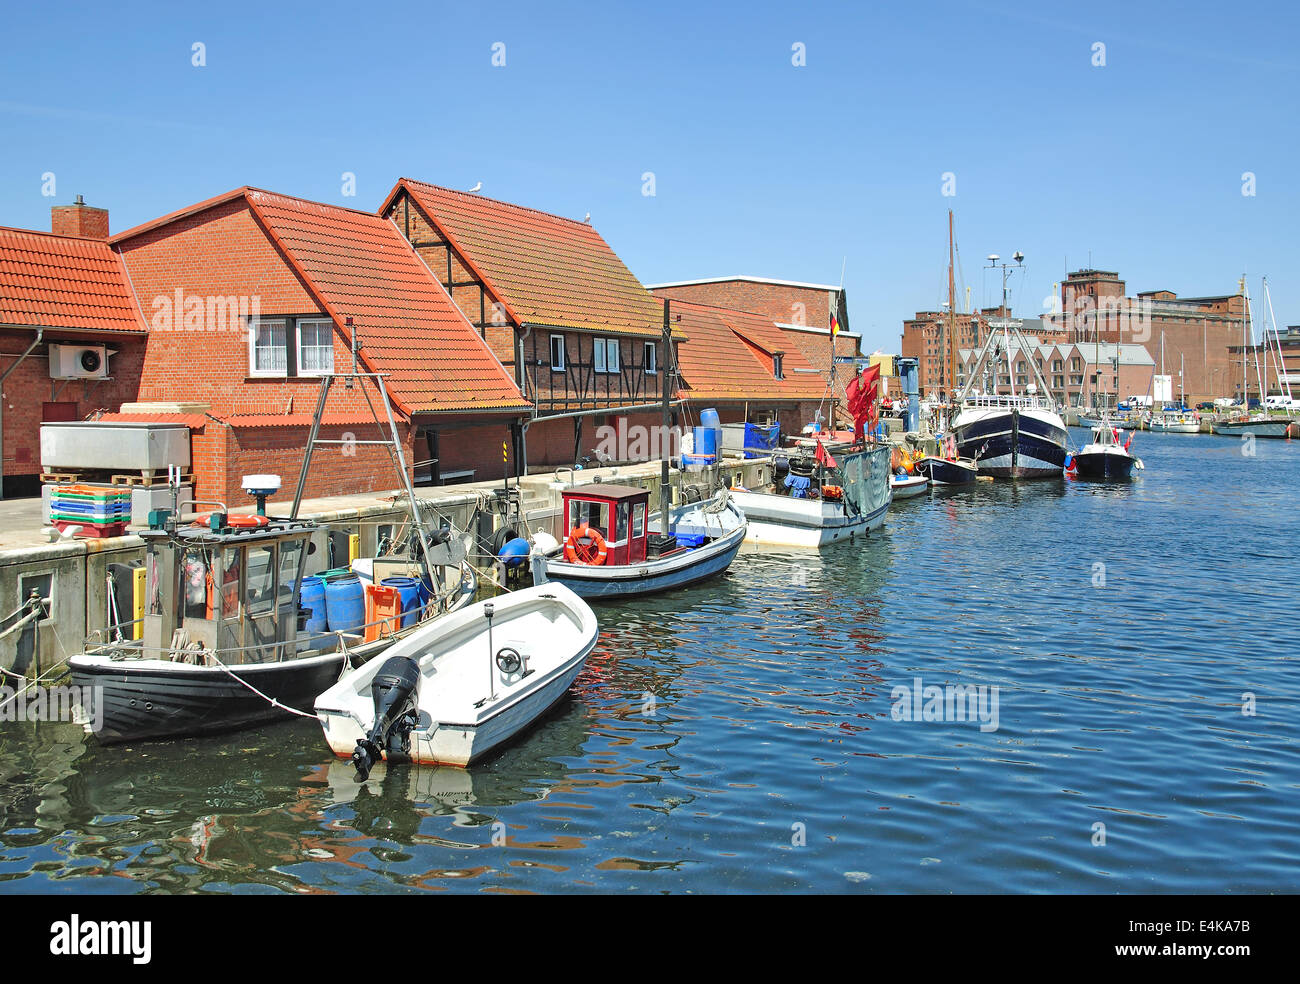 Wismar,Baltic Sea,Germany - Stock Image